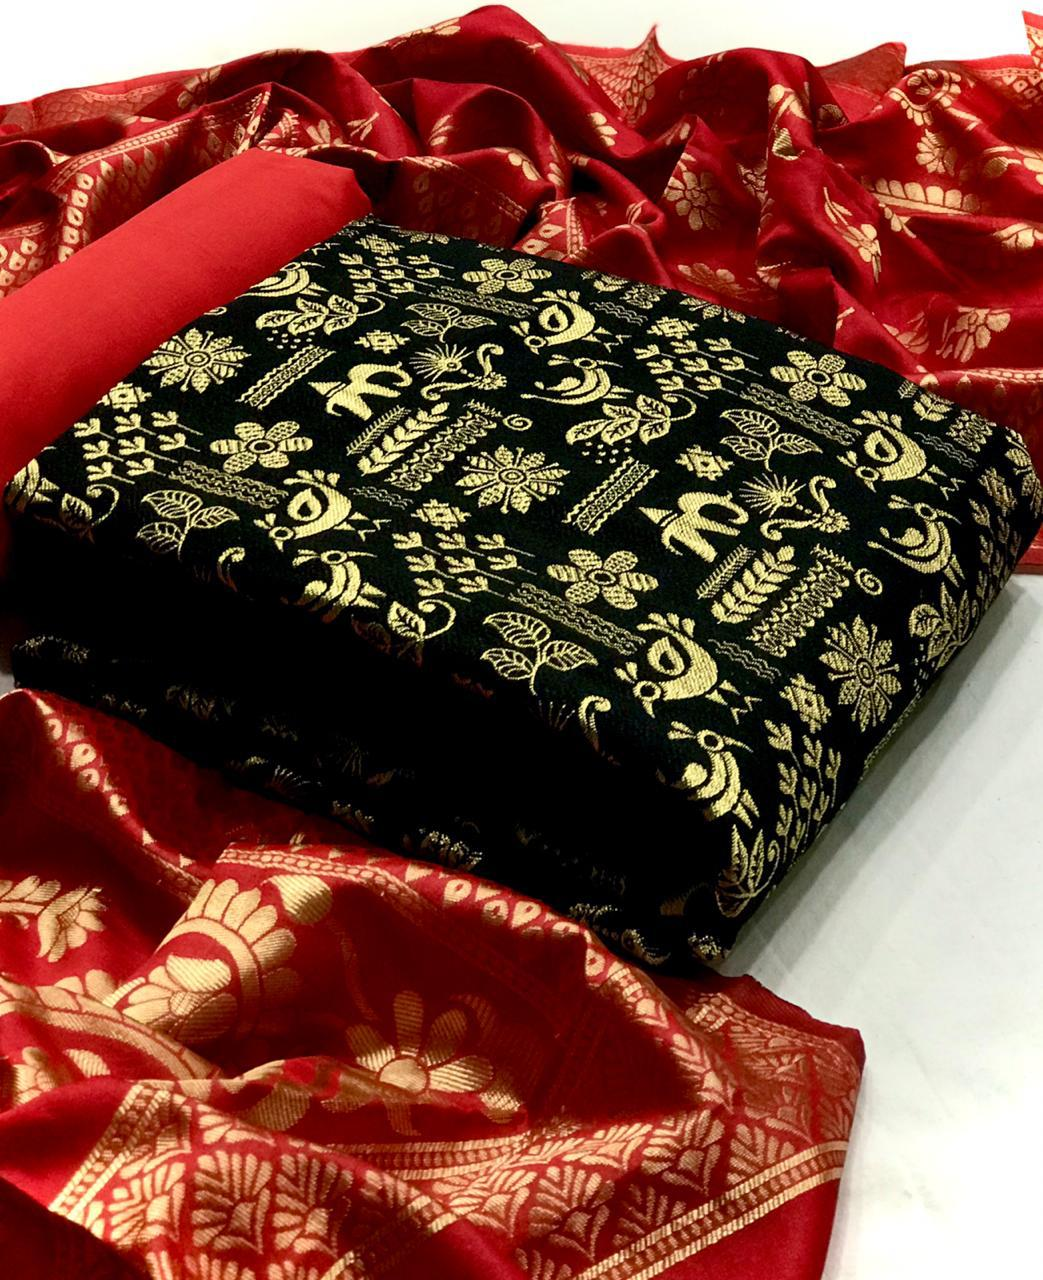 Banarasi Silk Suits Designer Banarasi Silk Suits In Single